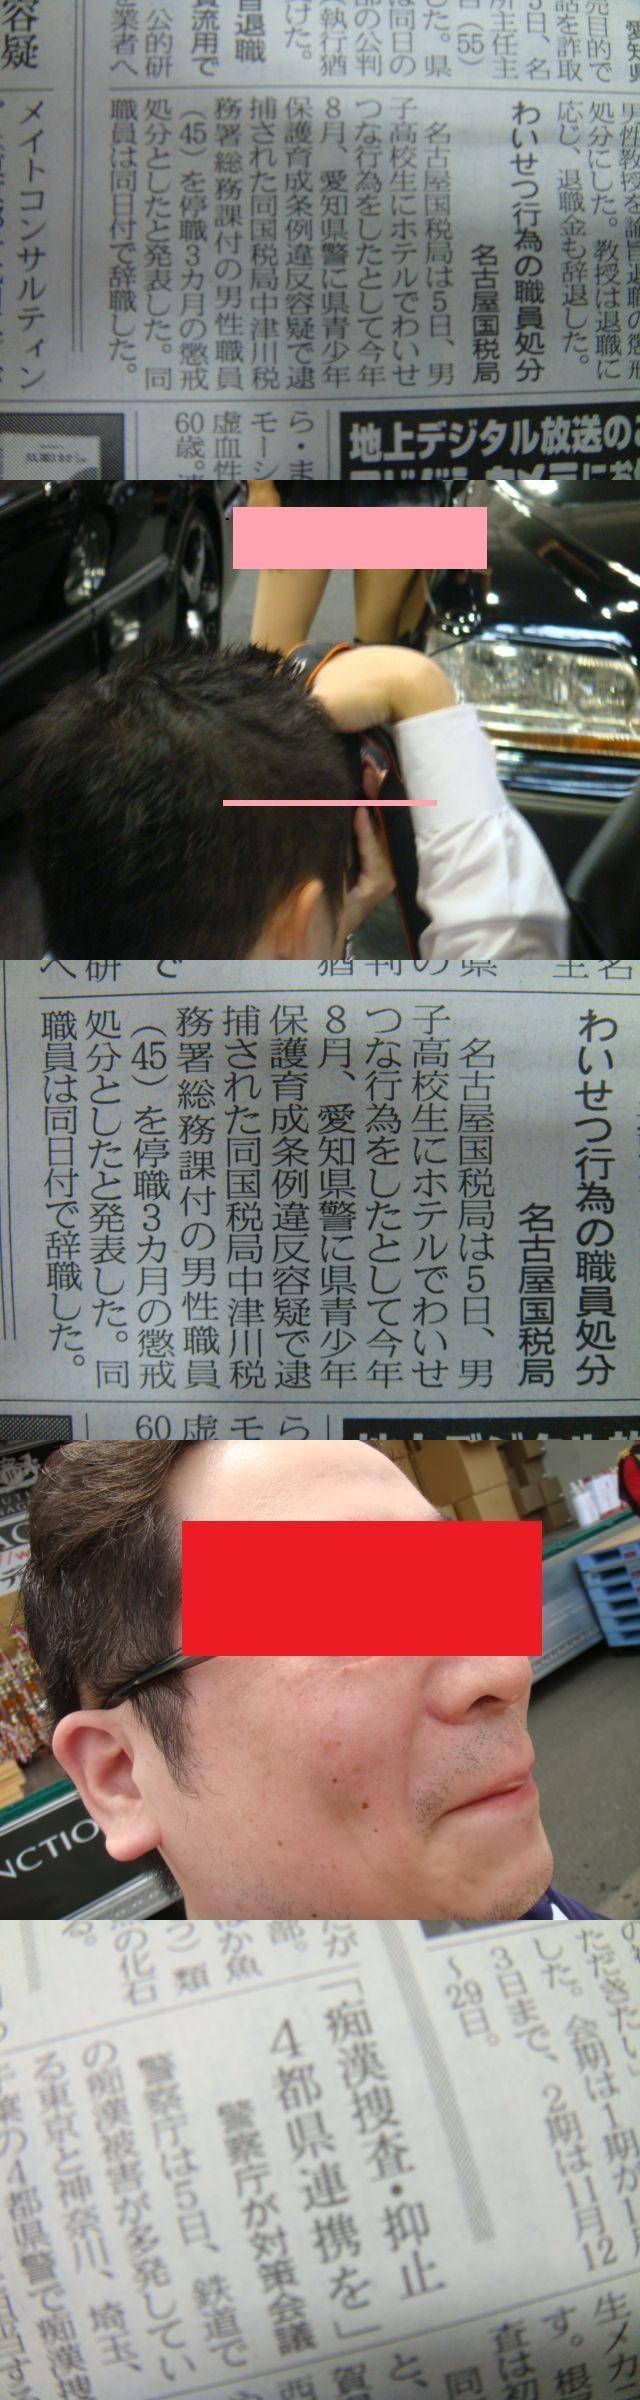 ce3092b7b44003 日本一の車屋!スターフェイスグループ 広報ブログ